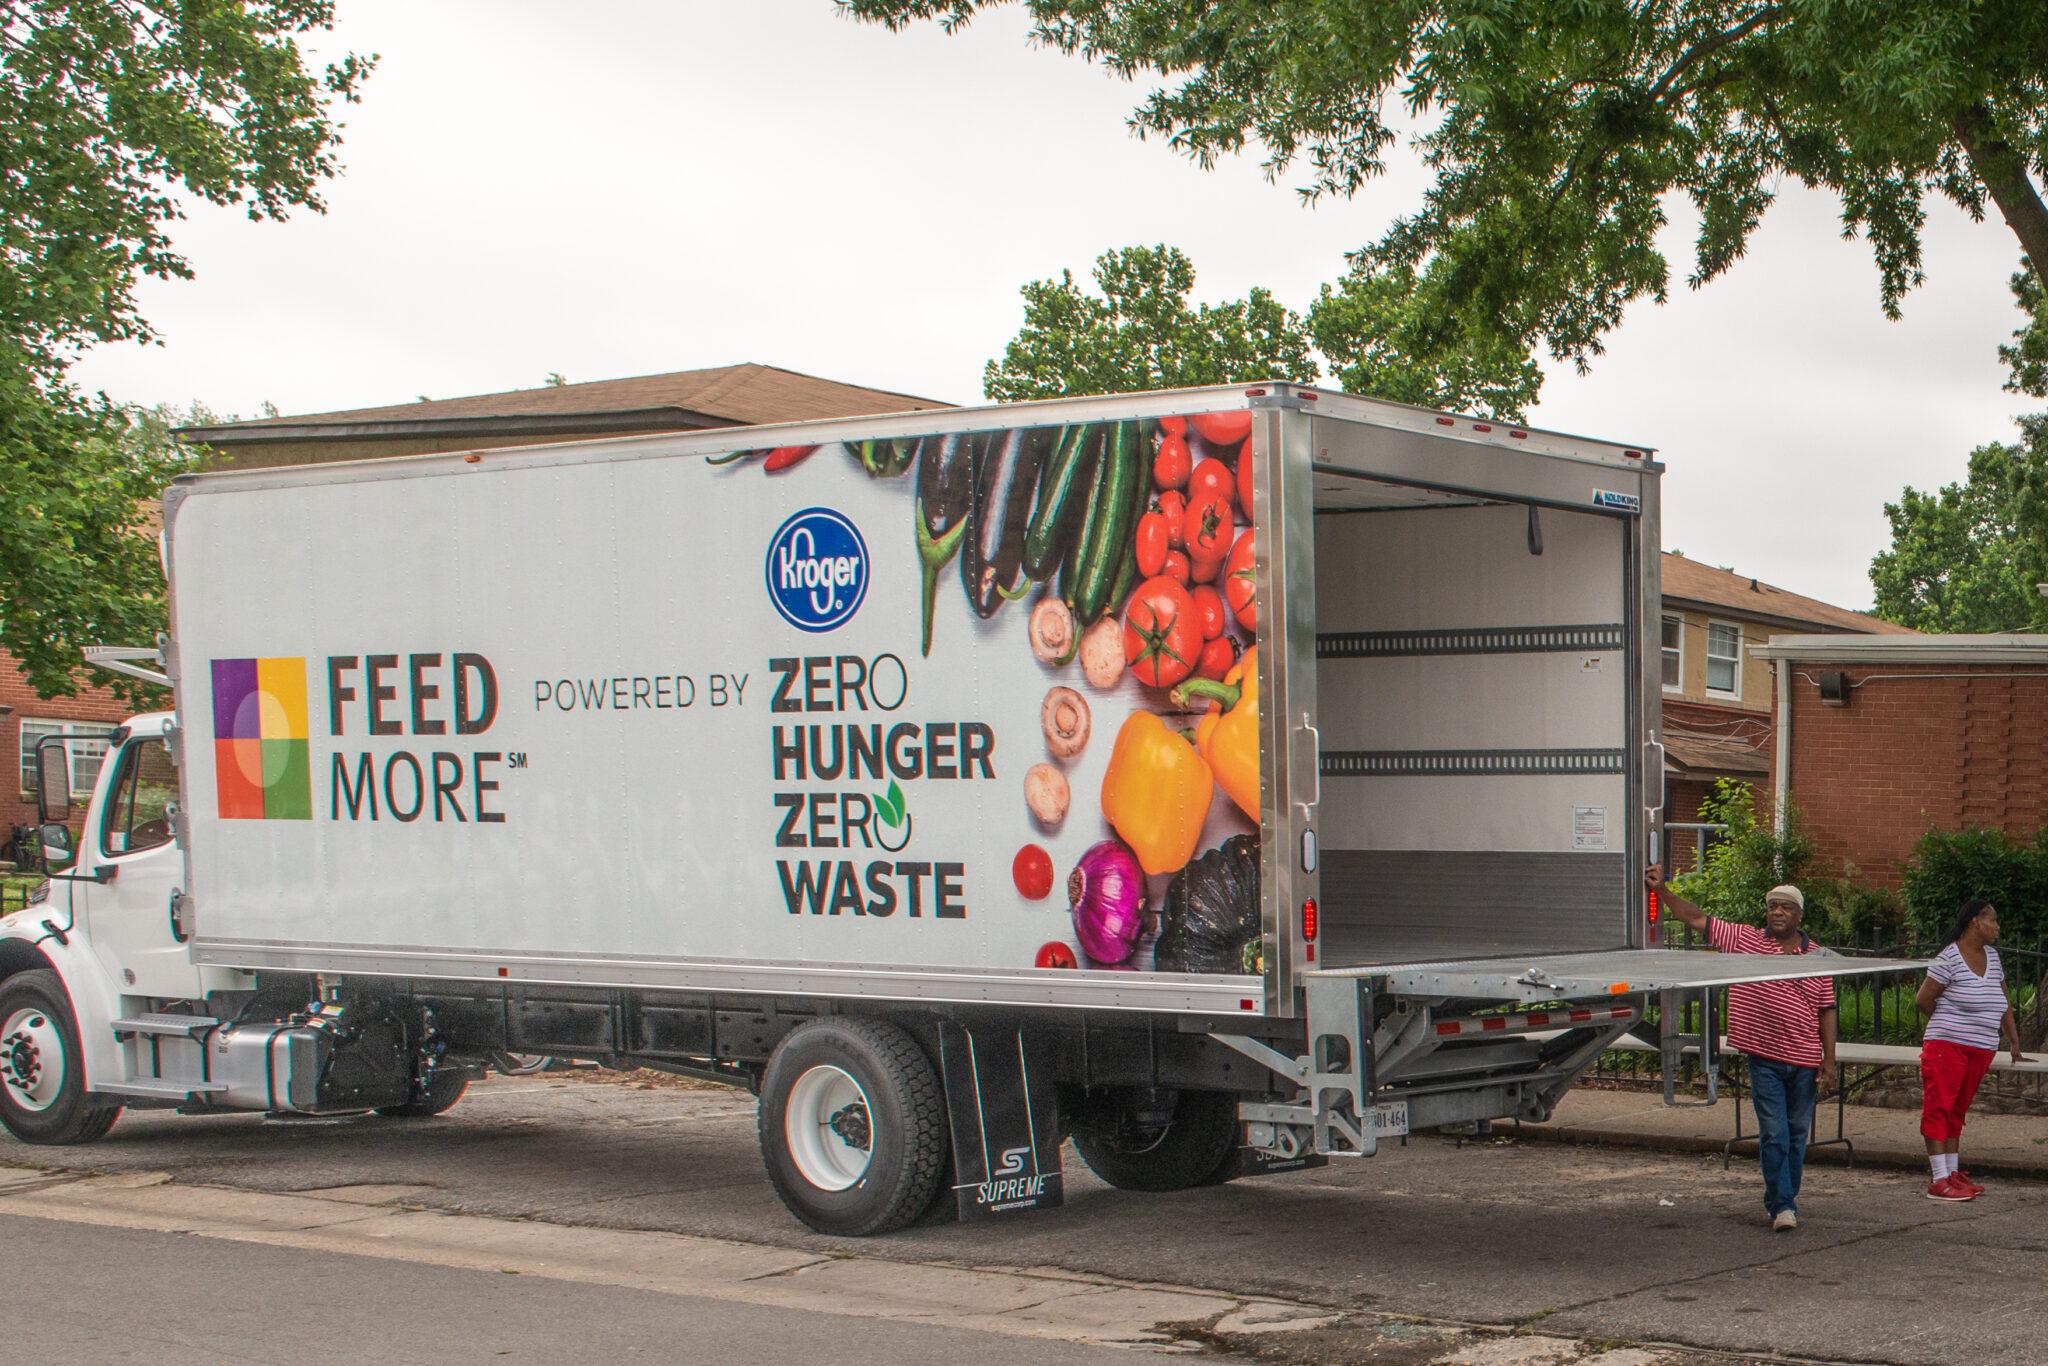 FeedMore truck